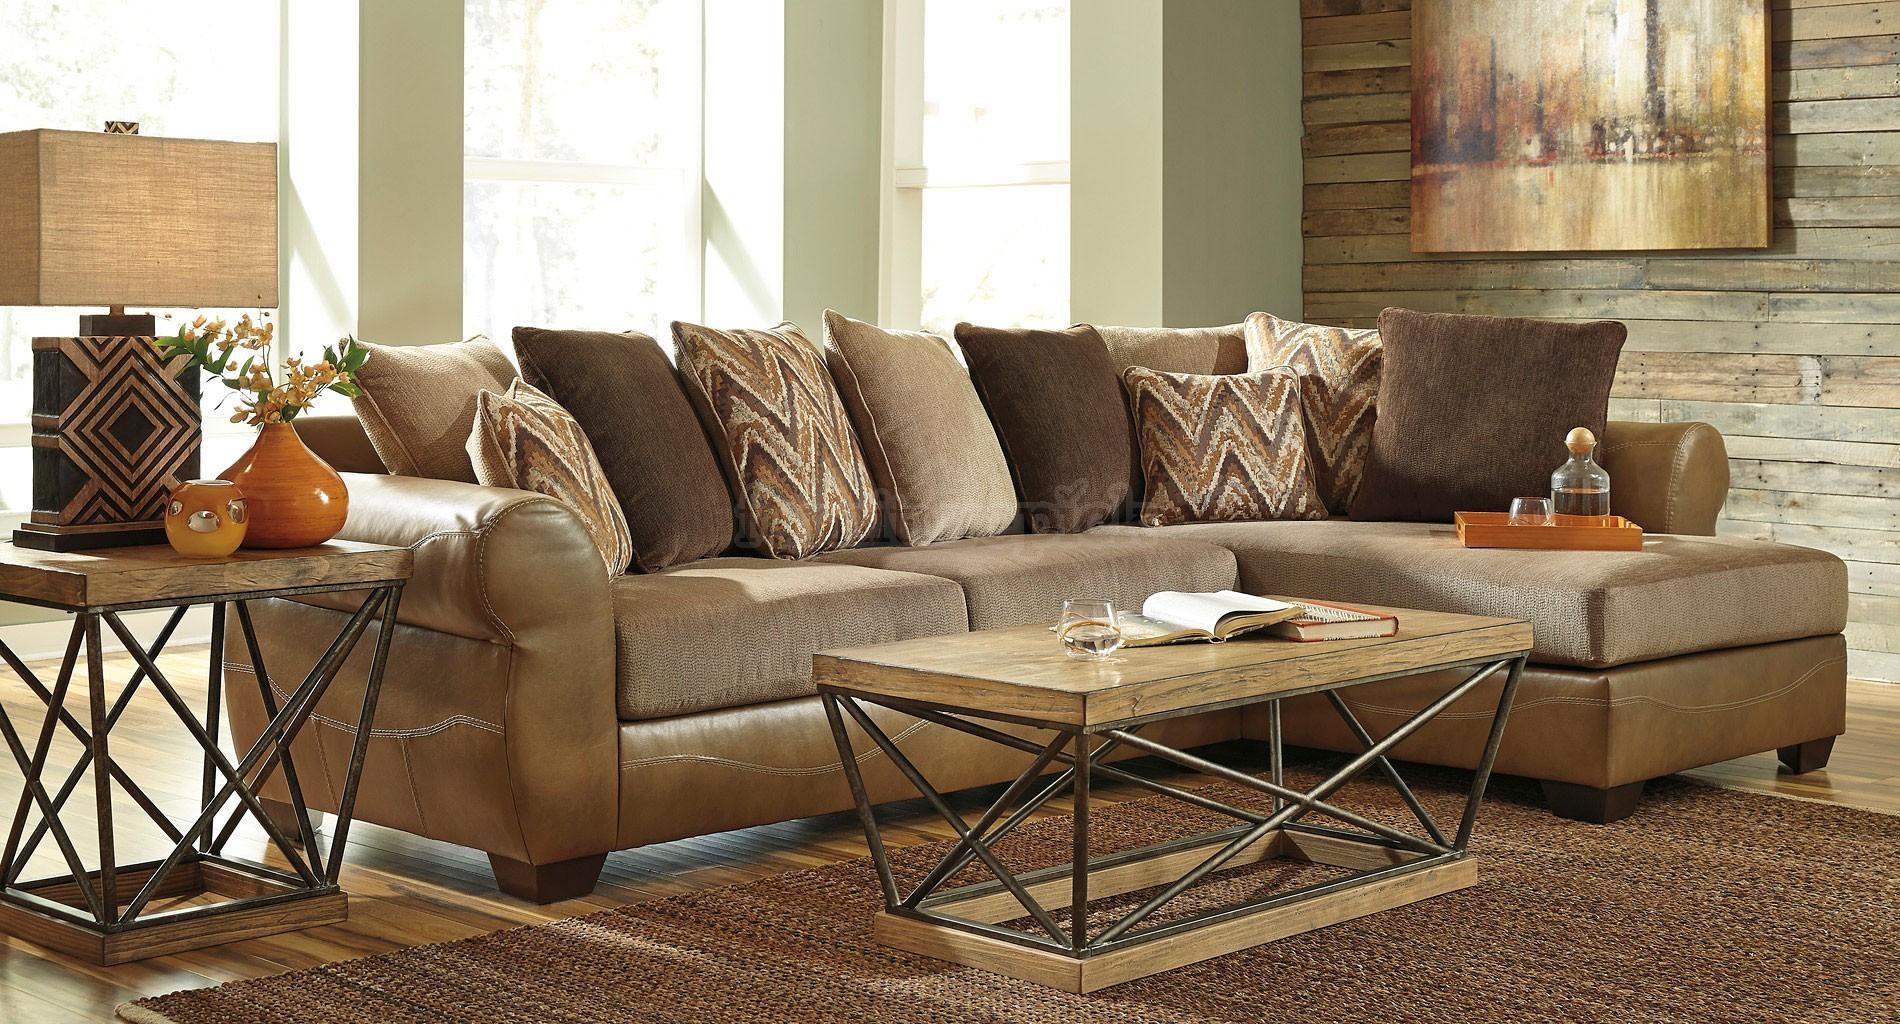 Mini Sectional Sofa Wholesalerssofa Sectionals Sale Tags : 51 Rare Regarding Mini Sectionals (Image 10 of 20)